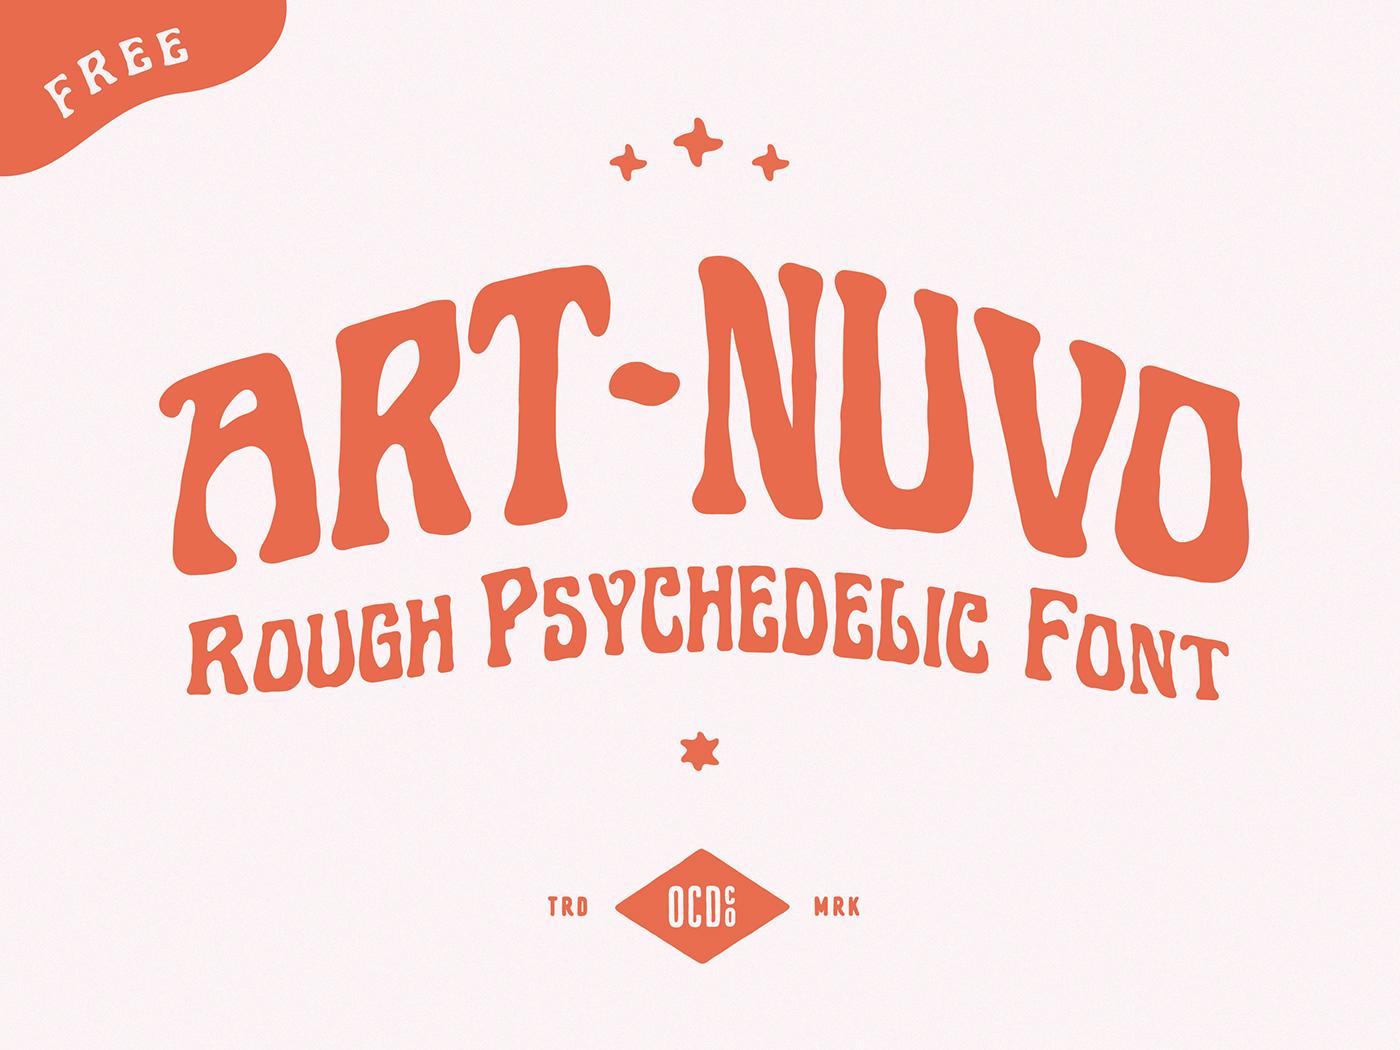 70s art nuveau free Free font freebie funky hand drawn psychedelic Retro rough